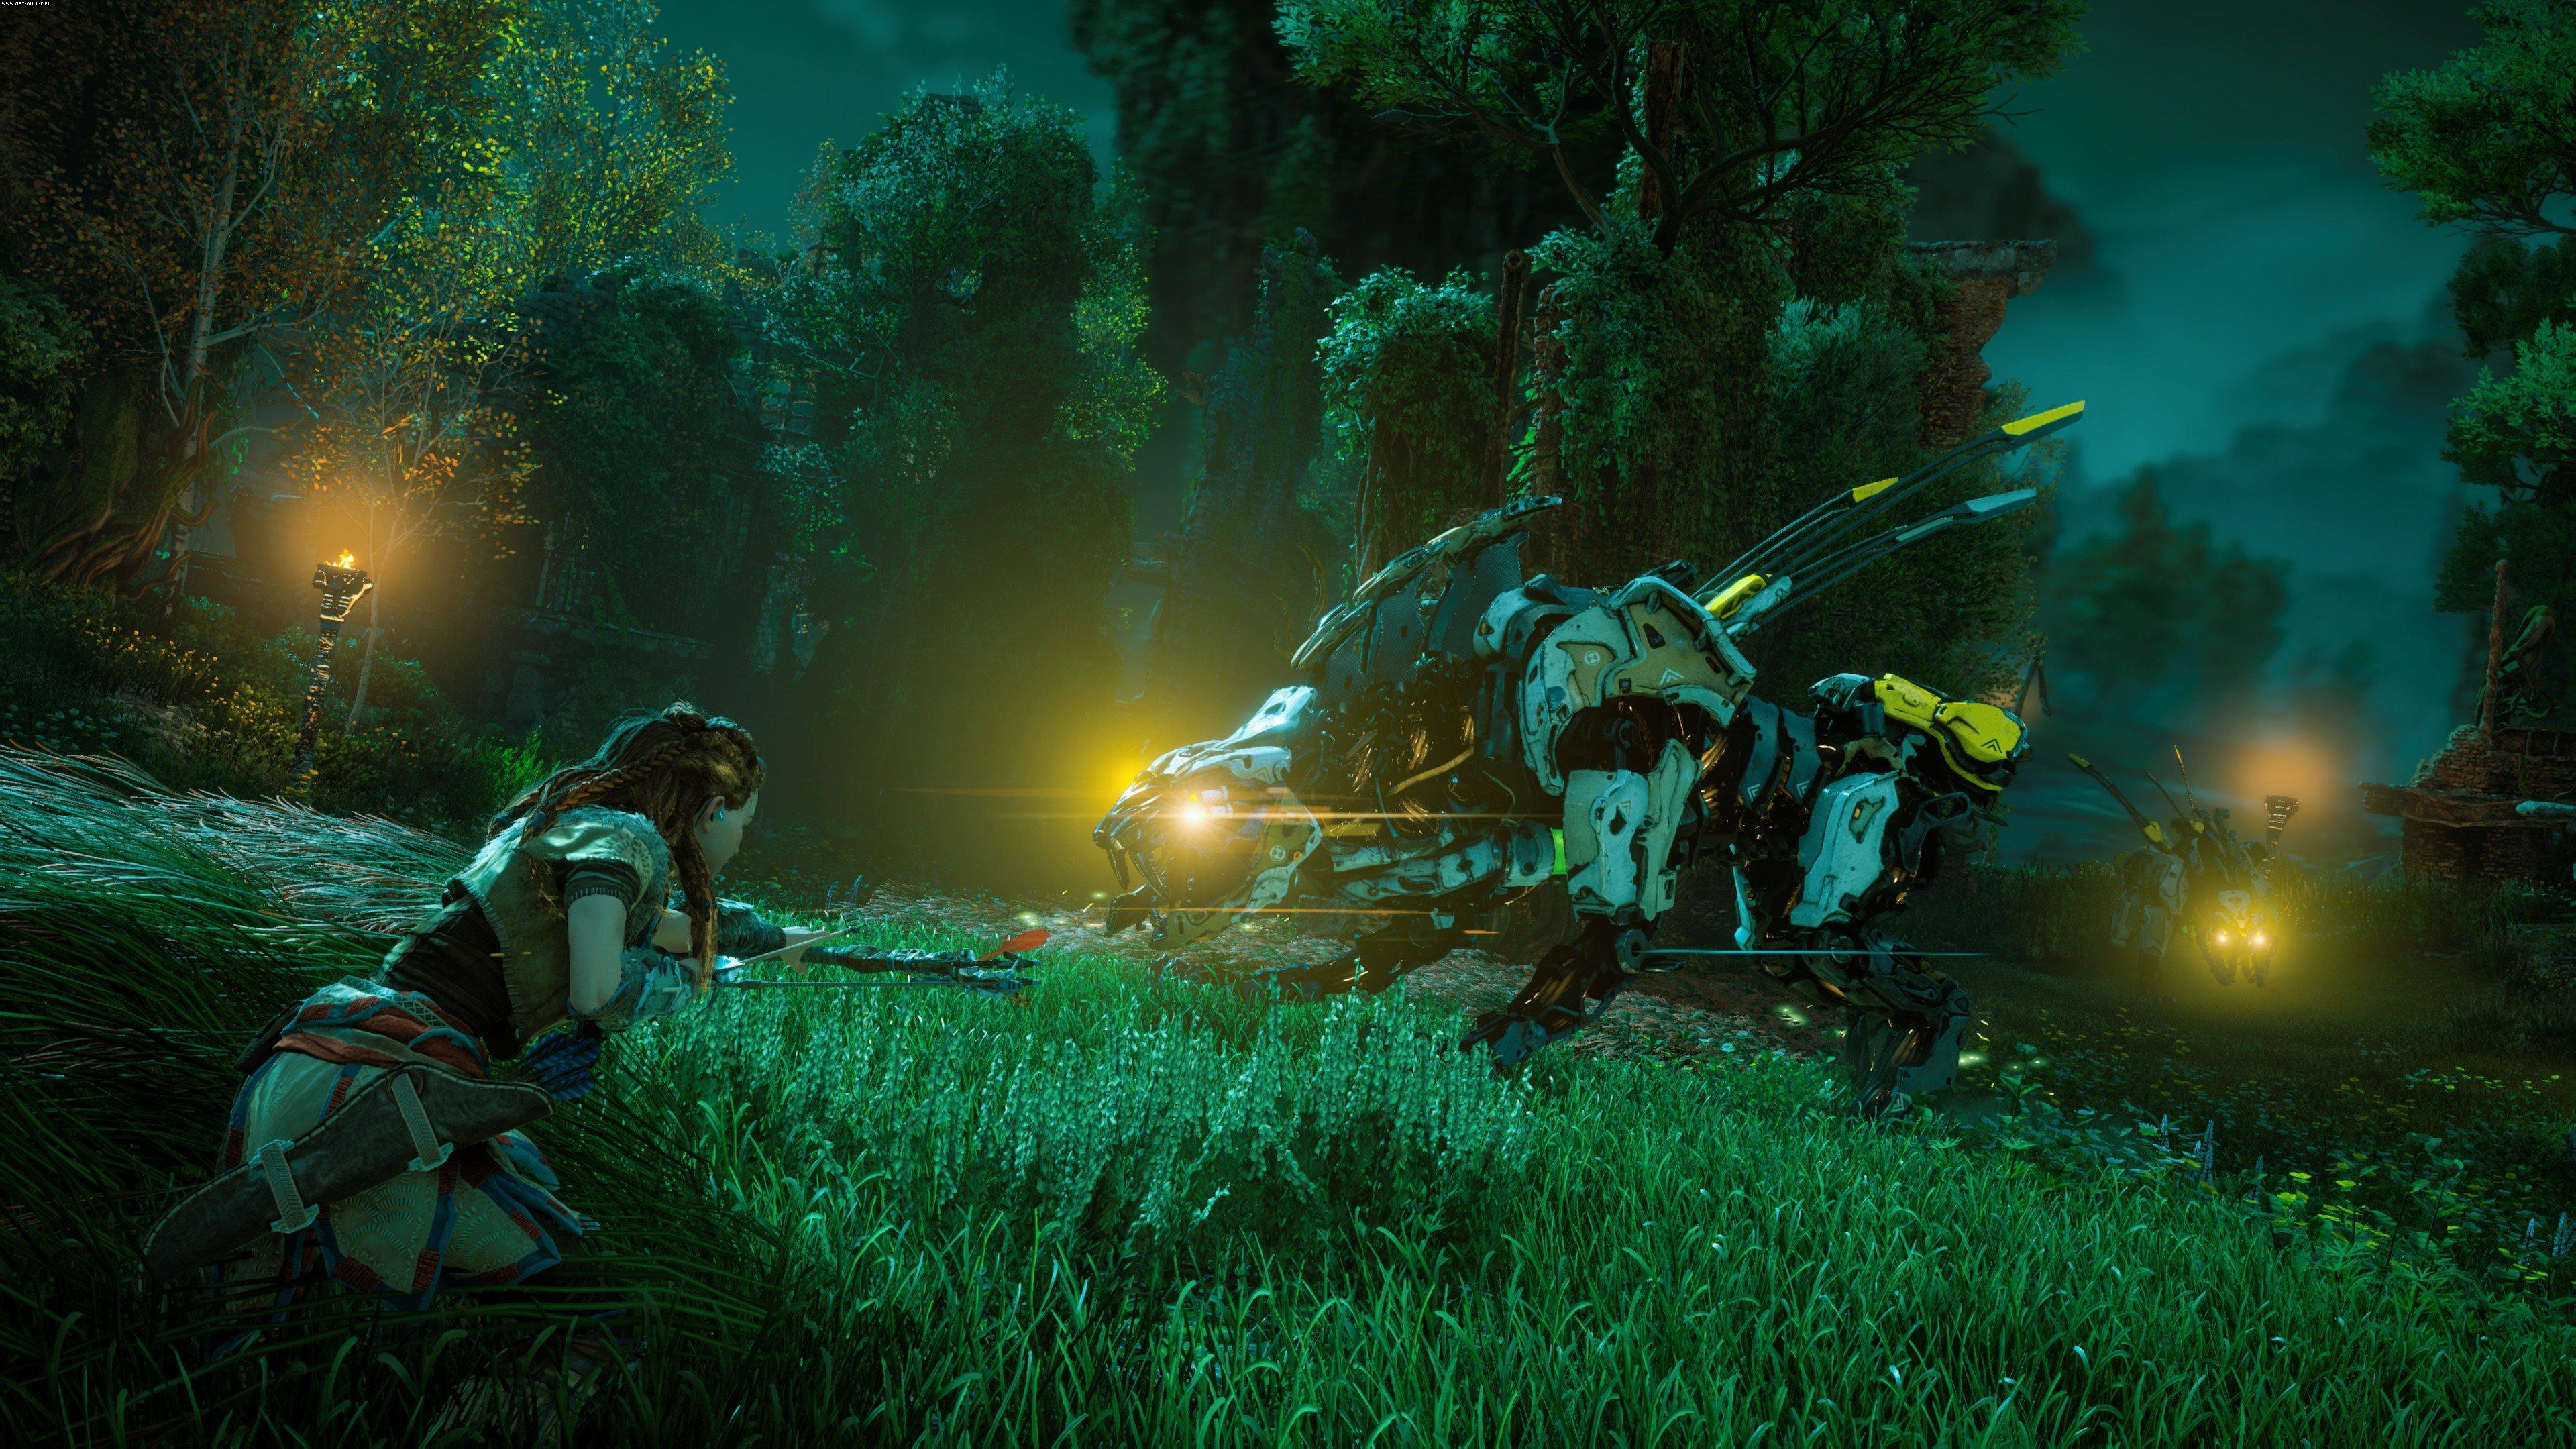 Horizon Zero Dawn PS4 Games Image 4/54, Guerrilla Games, Sony Interactive Entertainment